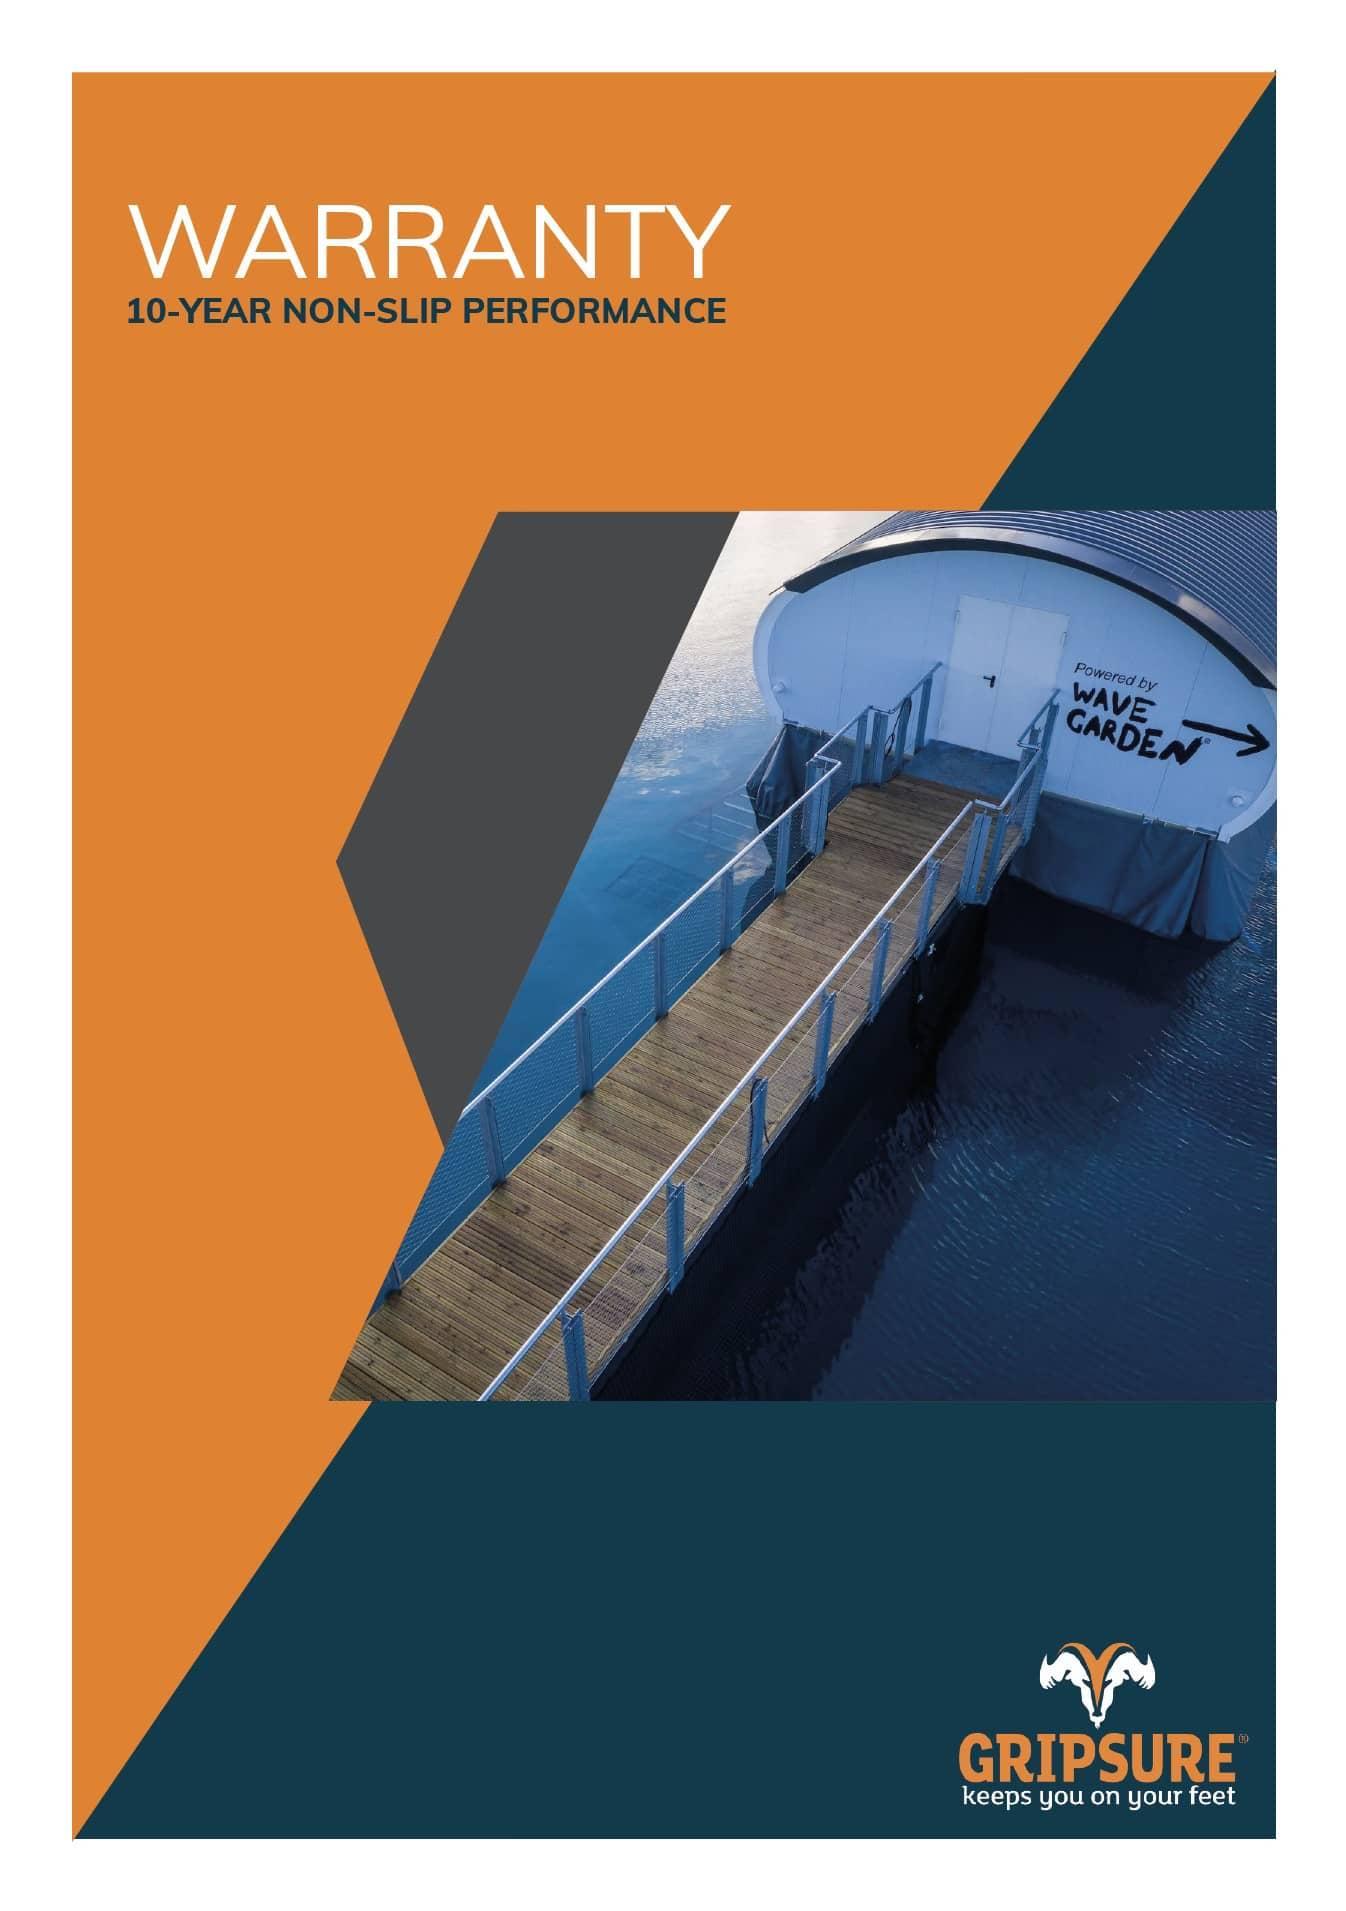 Gripsure's 10-Year Performance Warranty